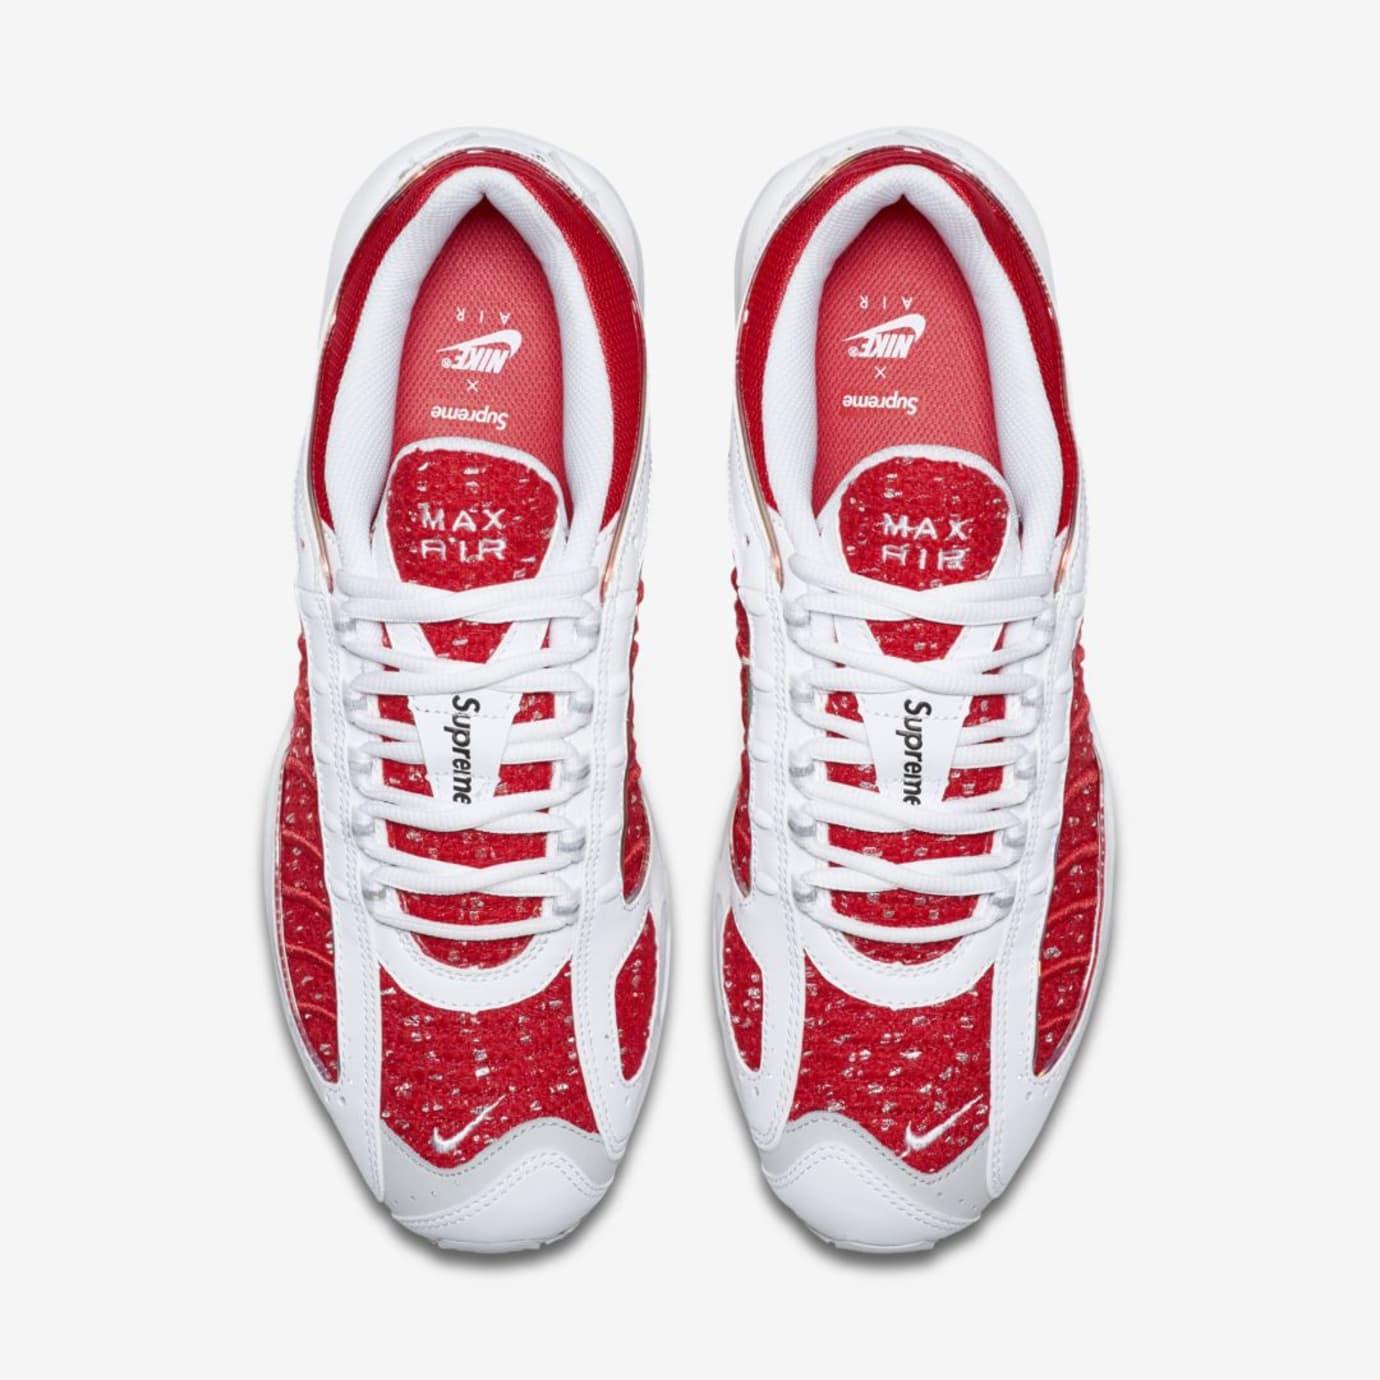 Image via  J23app · Supreme x Nike Air Max Tailwind 4  White University Red -White-Geyser 1ca4a71233ee